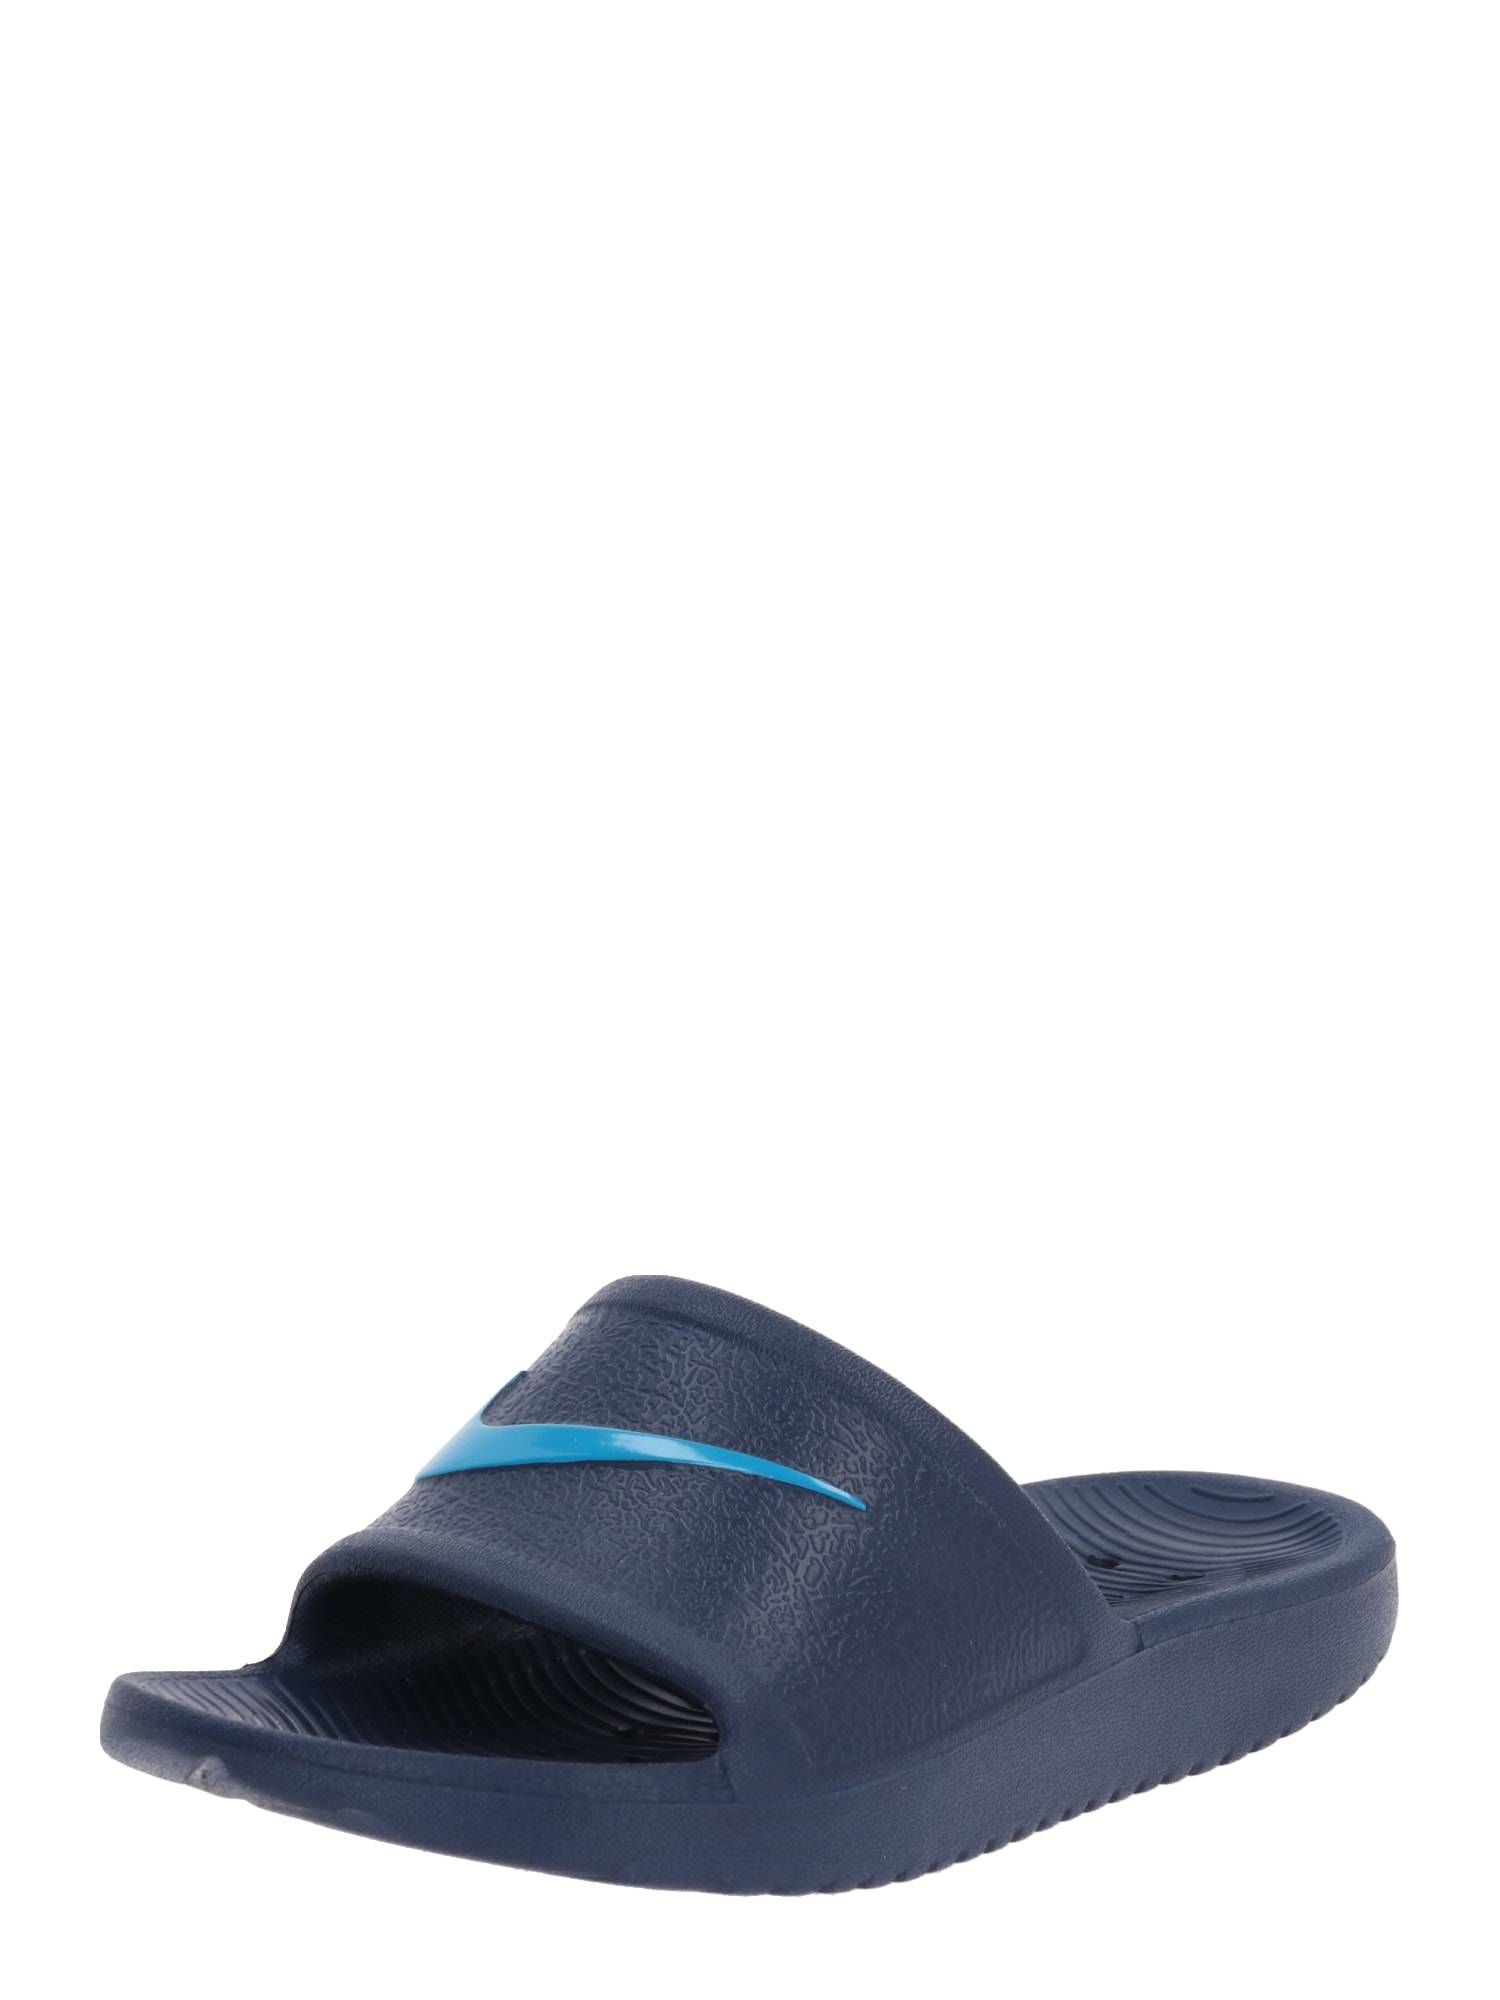 Nike Sportswear Claquettes / Tongs 'KAWA'  - Bleu - Taille: 3Y - boy